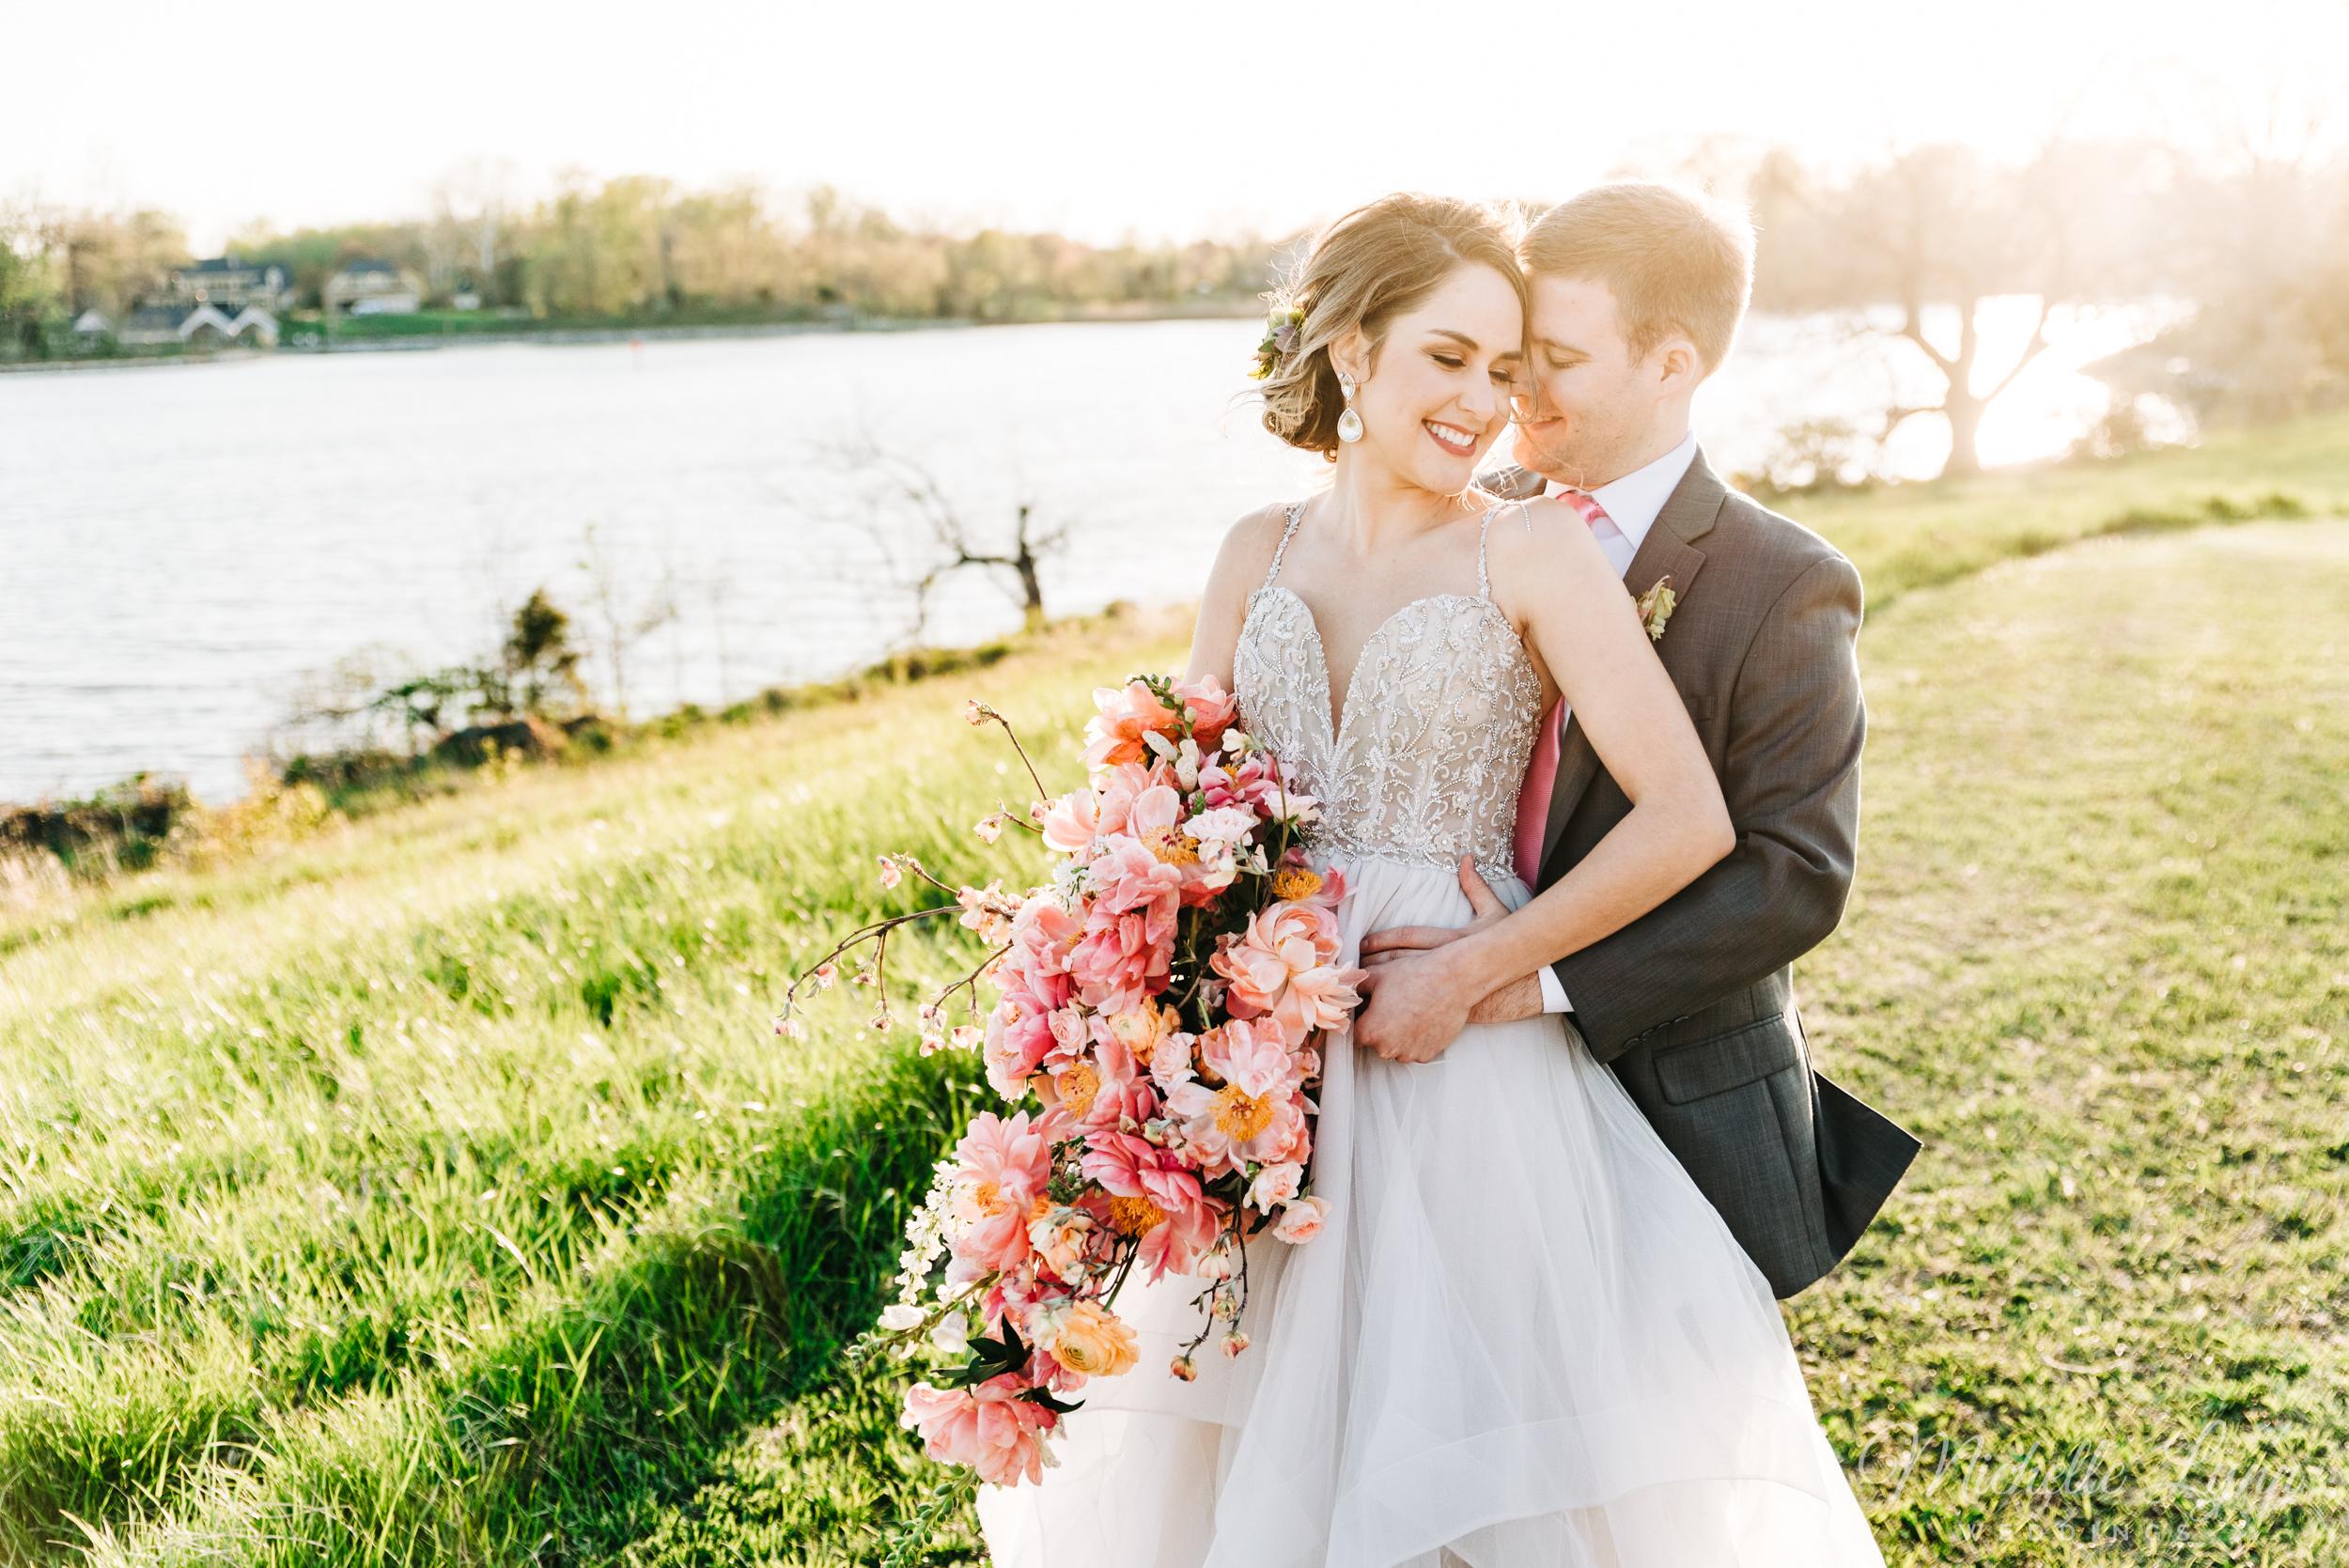 mlw-whitehall-annapolis-maryland-wedding-43.jpg